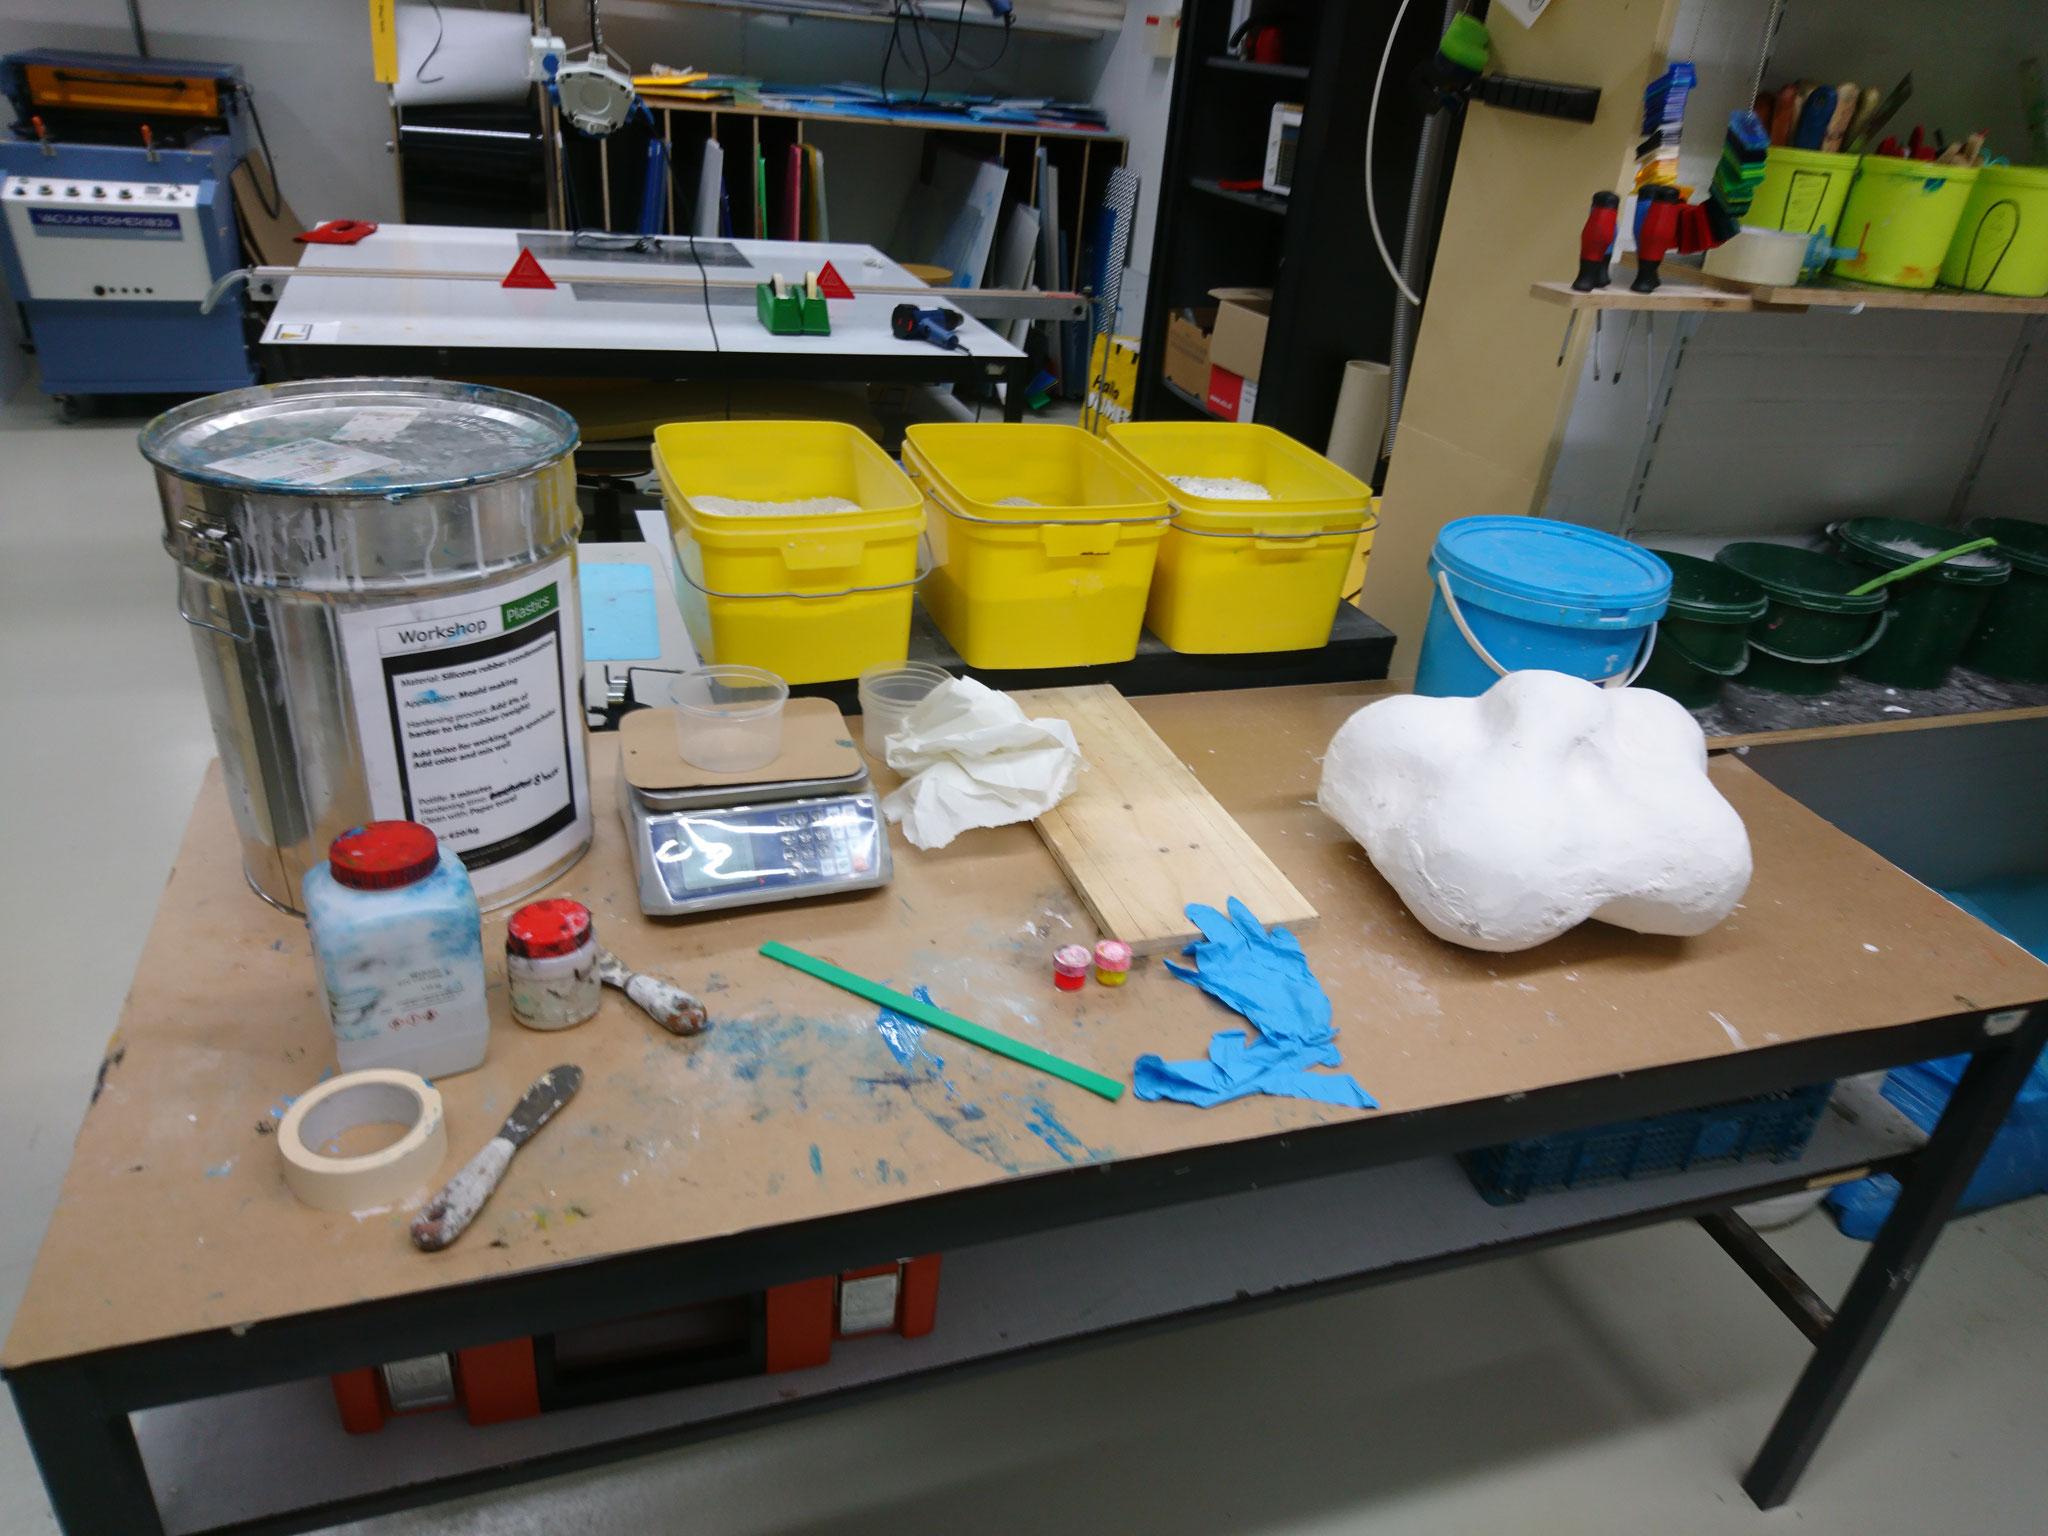 Experiments at the plastic workshop